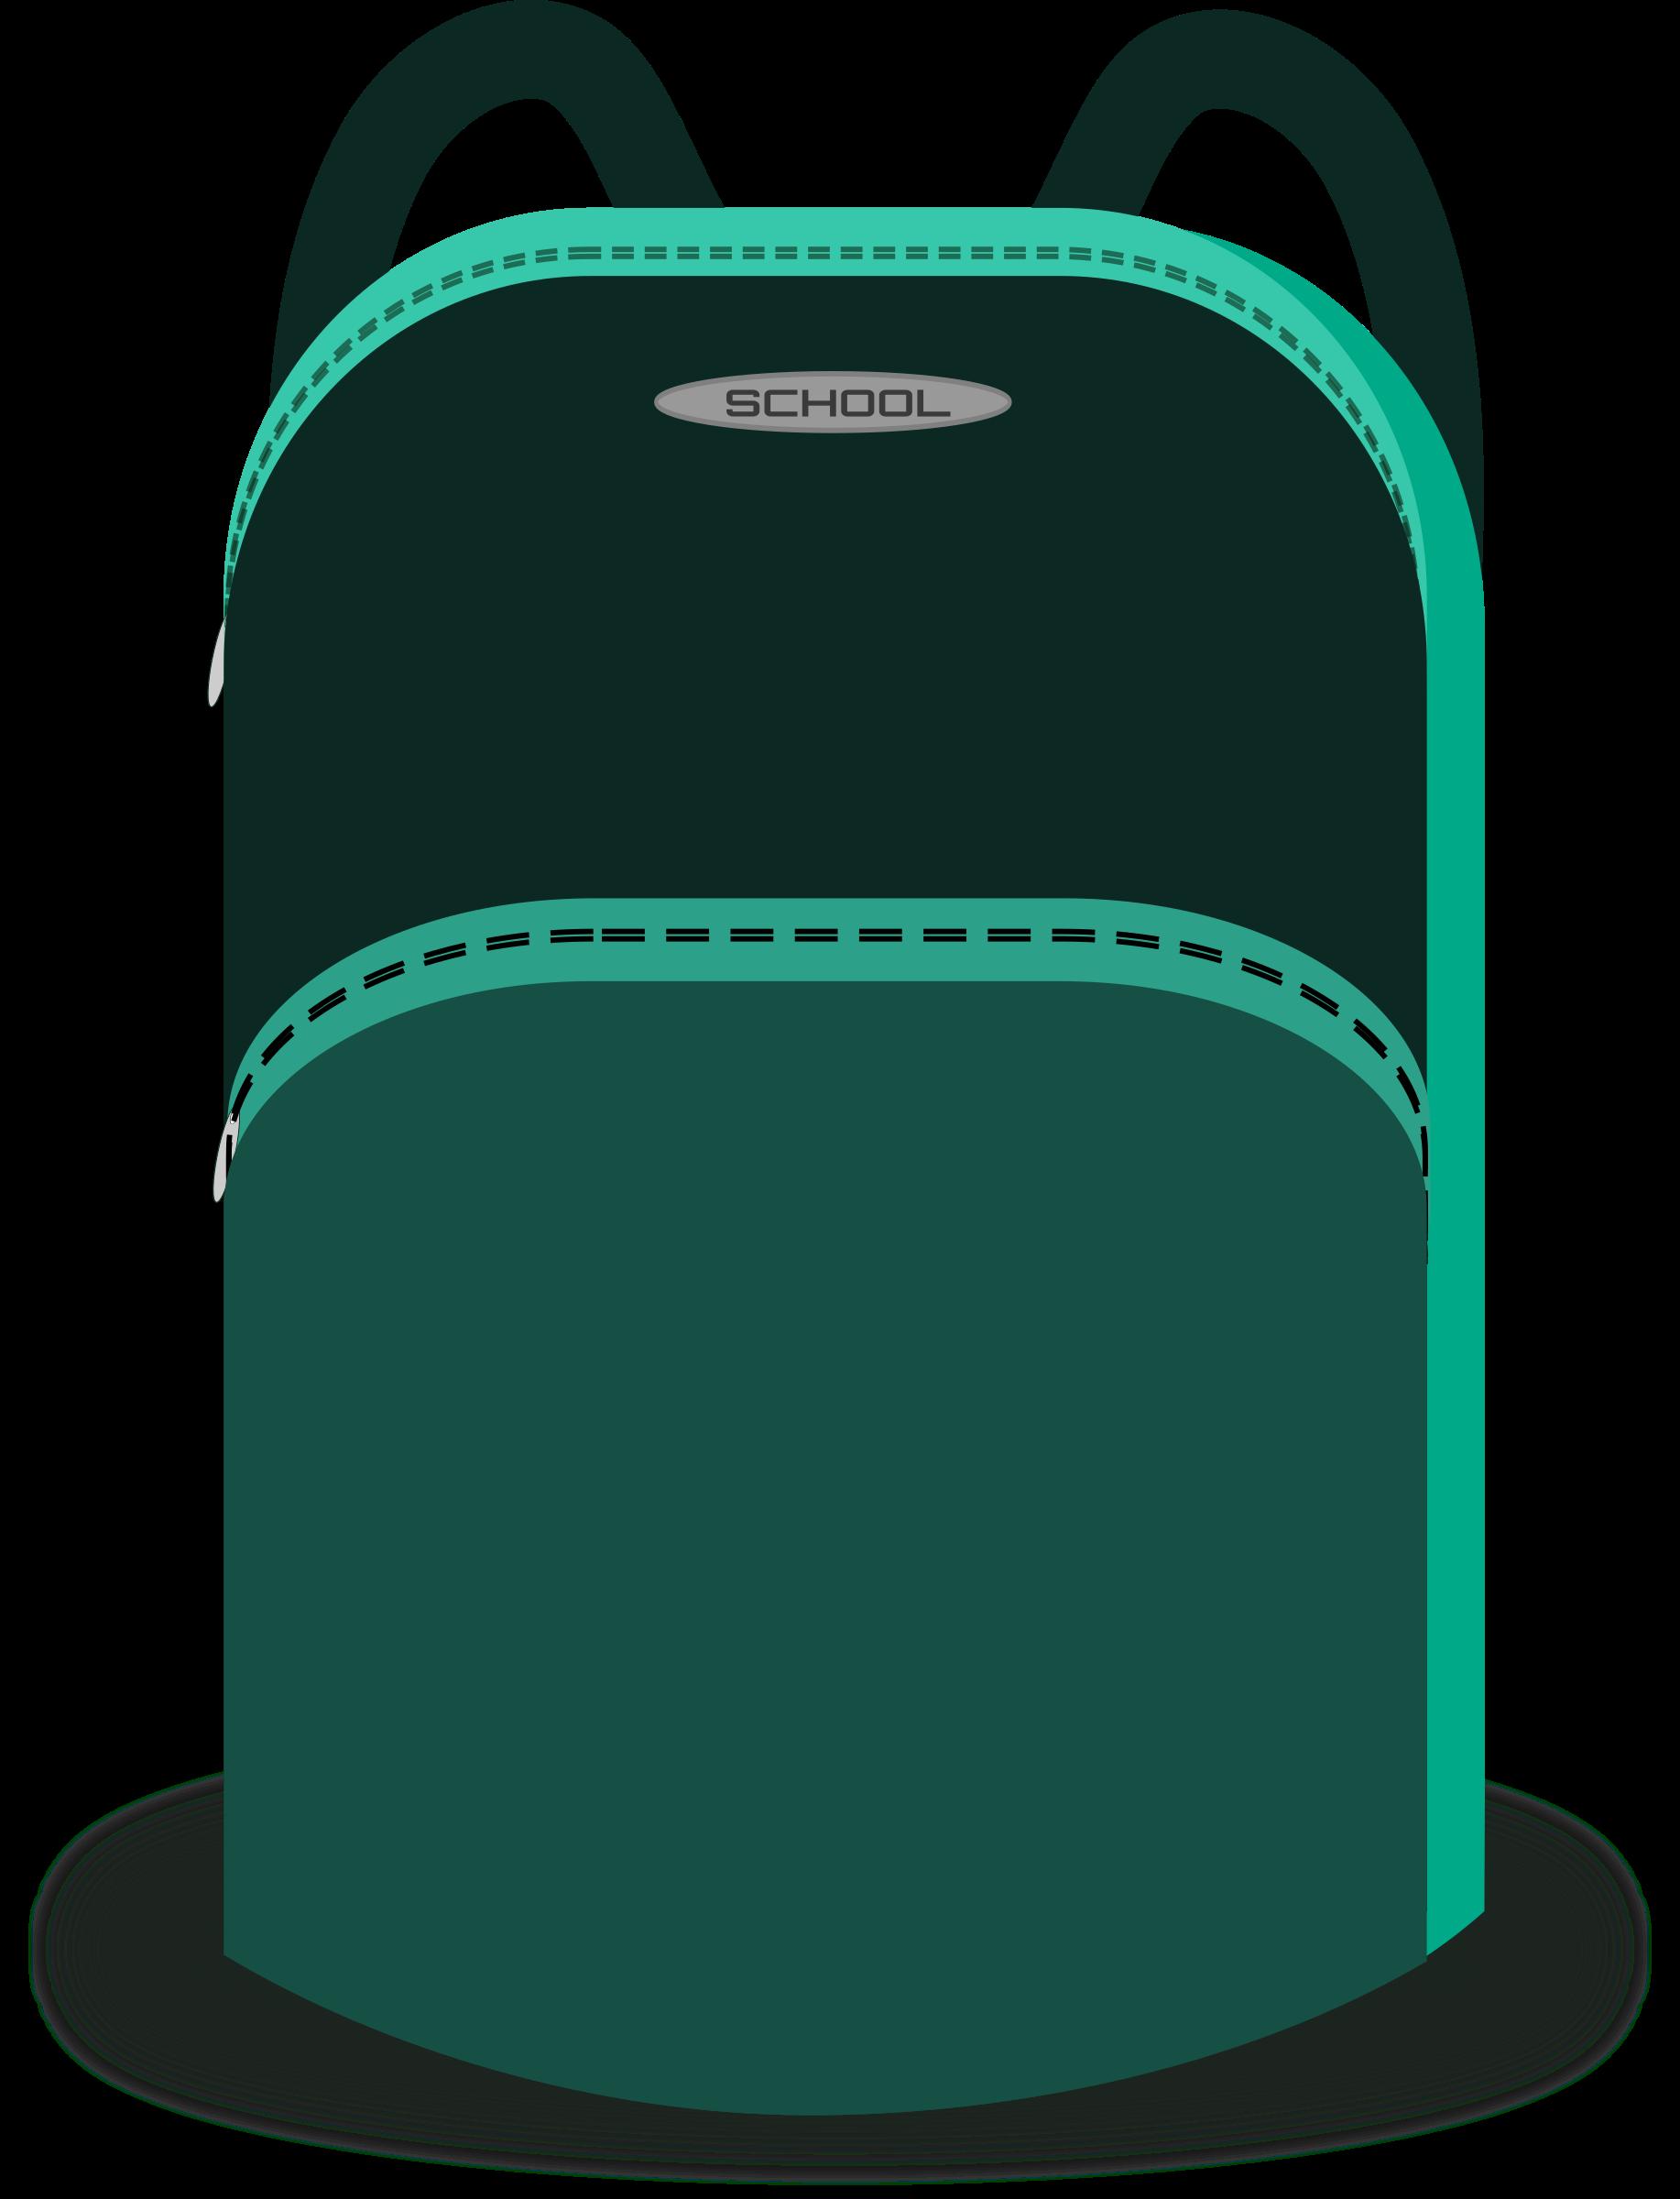 Emergency clipart emergency backpack. School bag big image